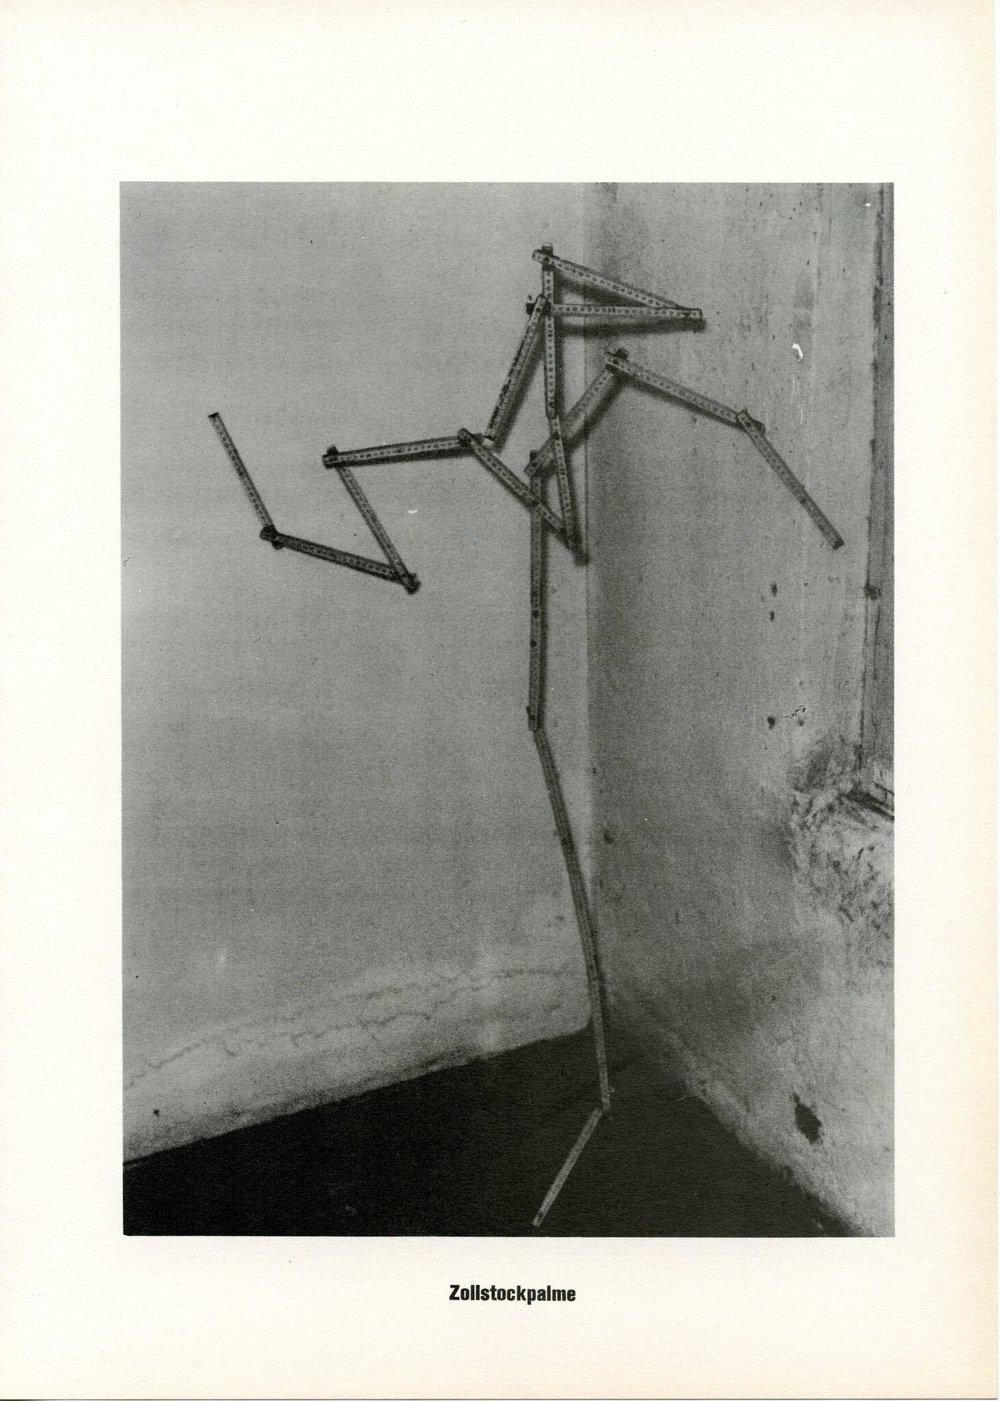 Sigmar Polke Zollstockpalme from ...Höhere Wesen befehlen, 1968